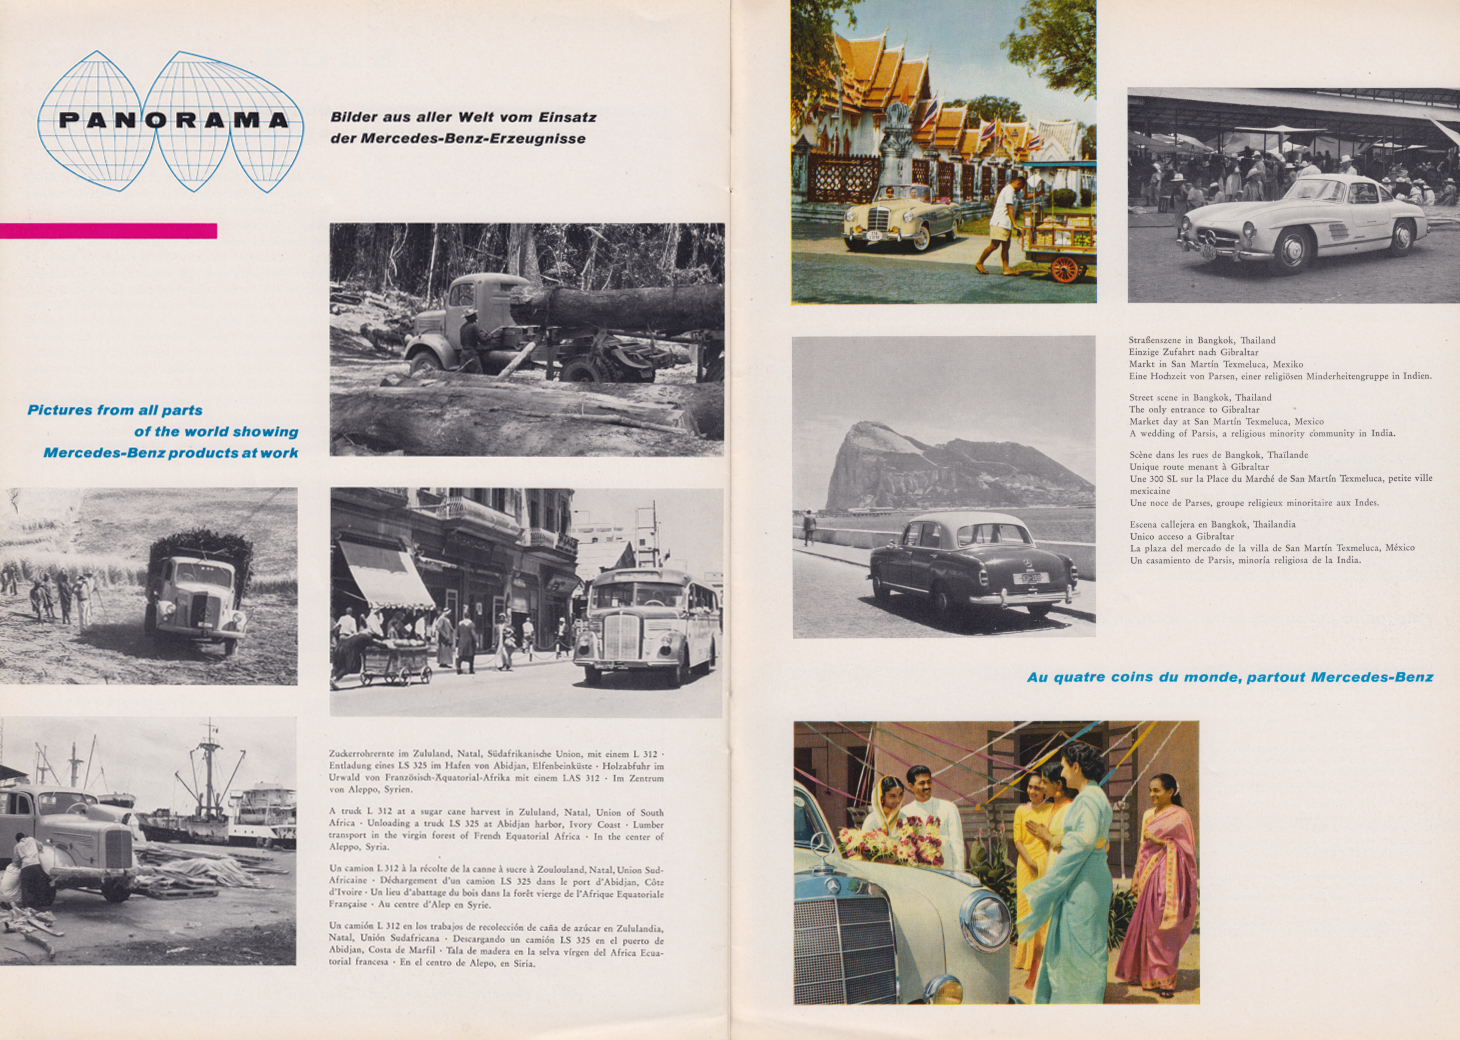 (REVISTA): Periódico In aller welt n.º 29 - Mercedes-Benz no mundo - 1959 - multilingue 011